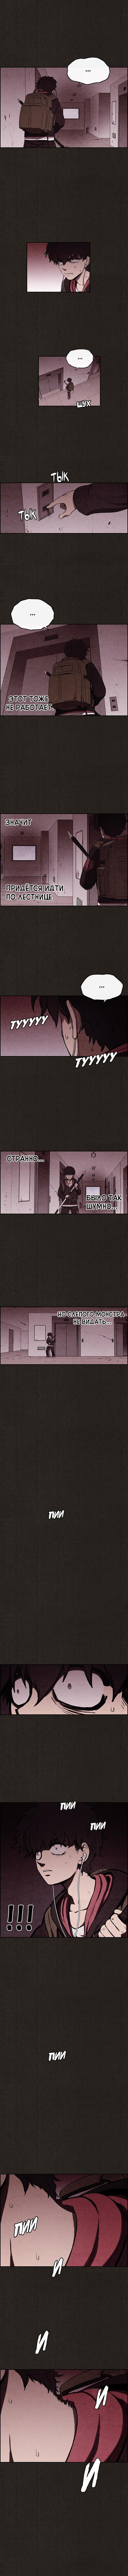 https://r1.ninemanga.com/comics/pic2/26/33050/415979/1532297890861.jpg Page 4